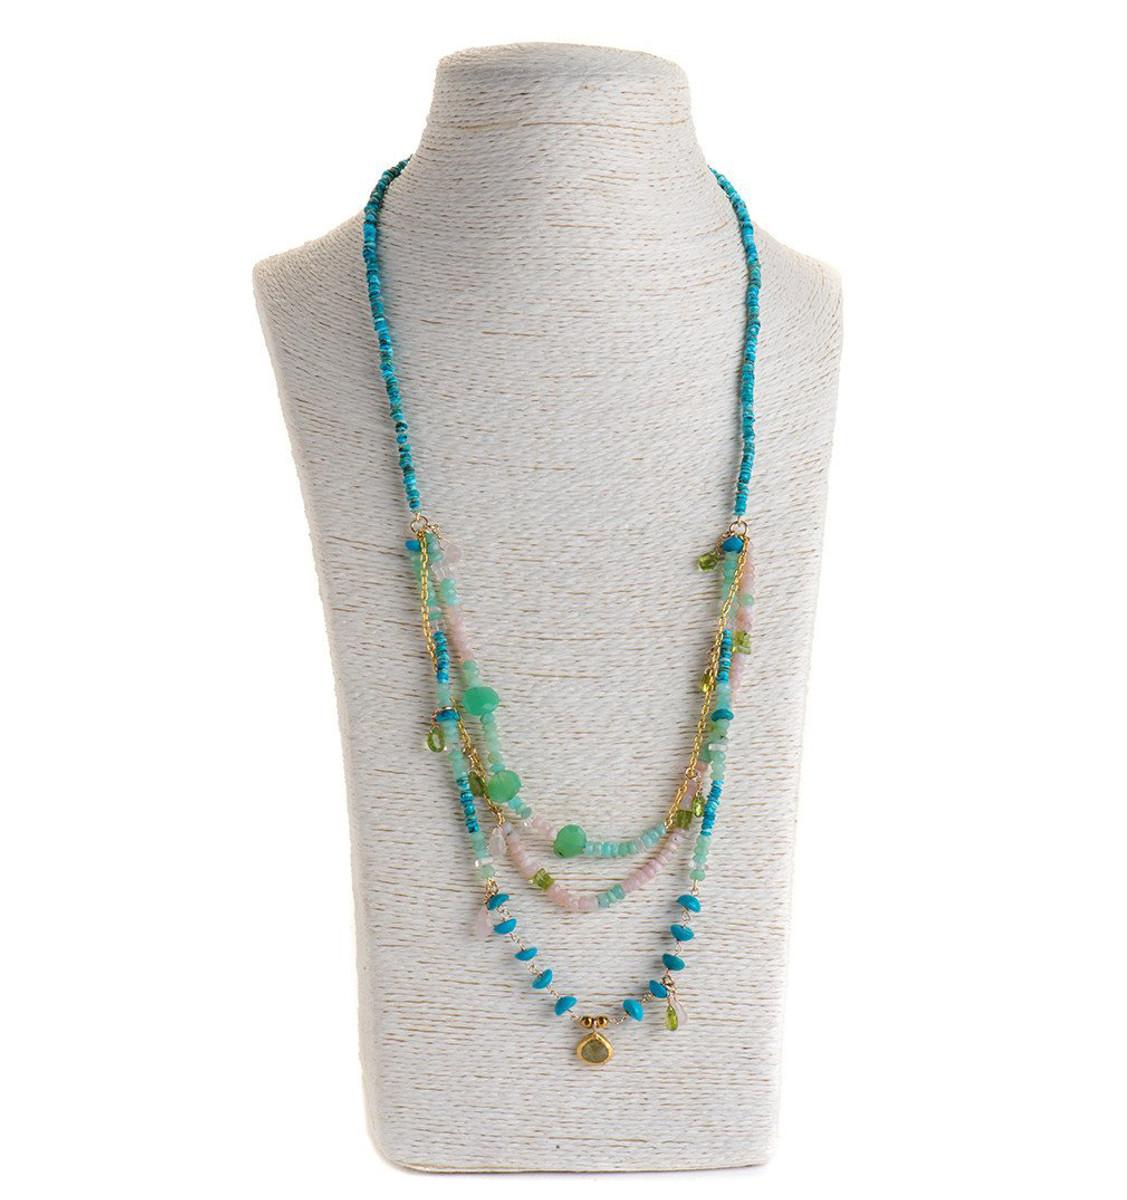 Valentines Special Necklace by Nava Zahavi - New Arrival